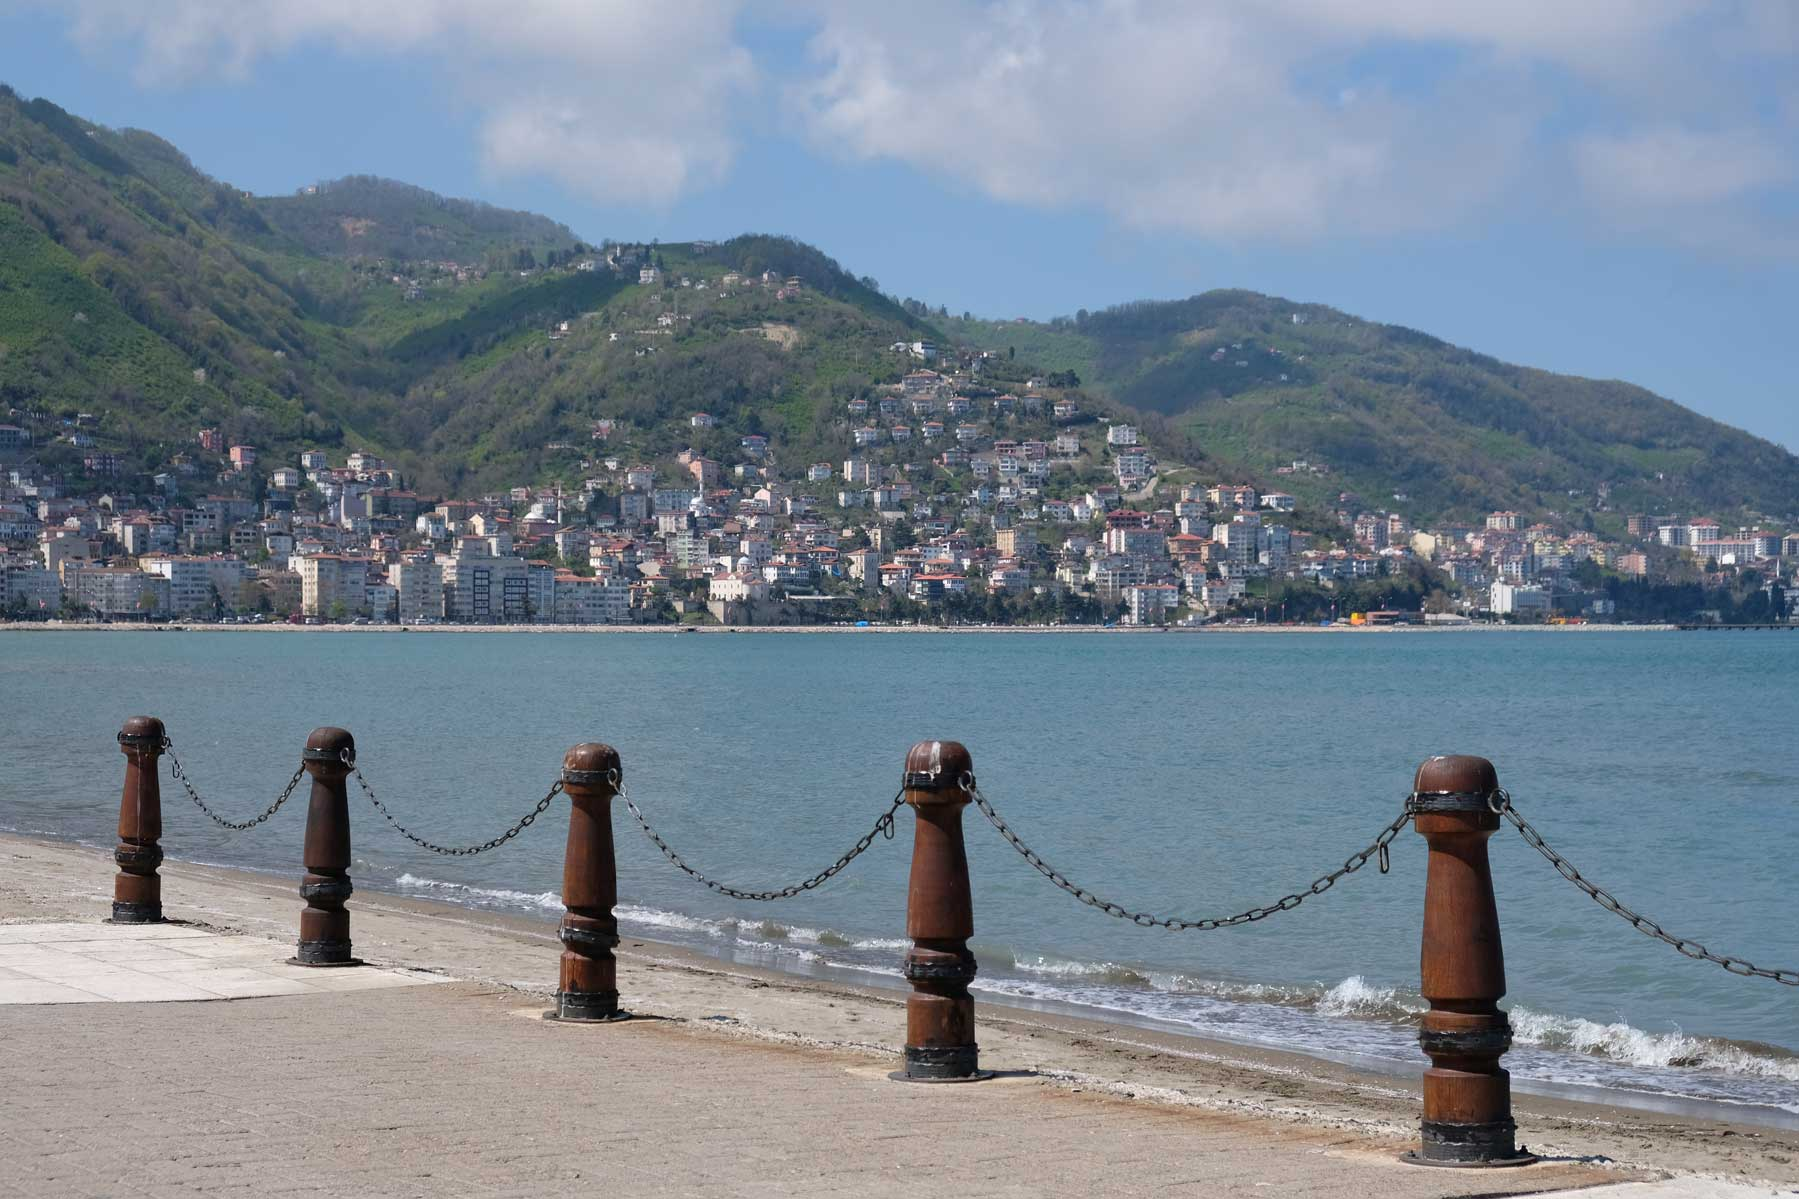 Uferpromenade in Ordu